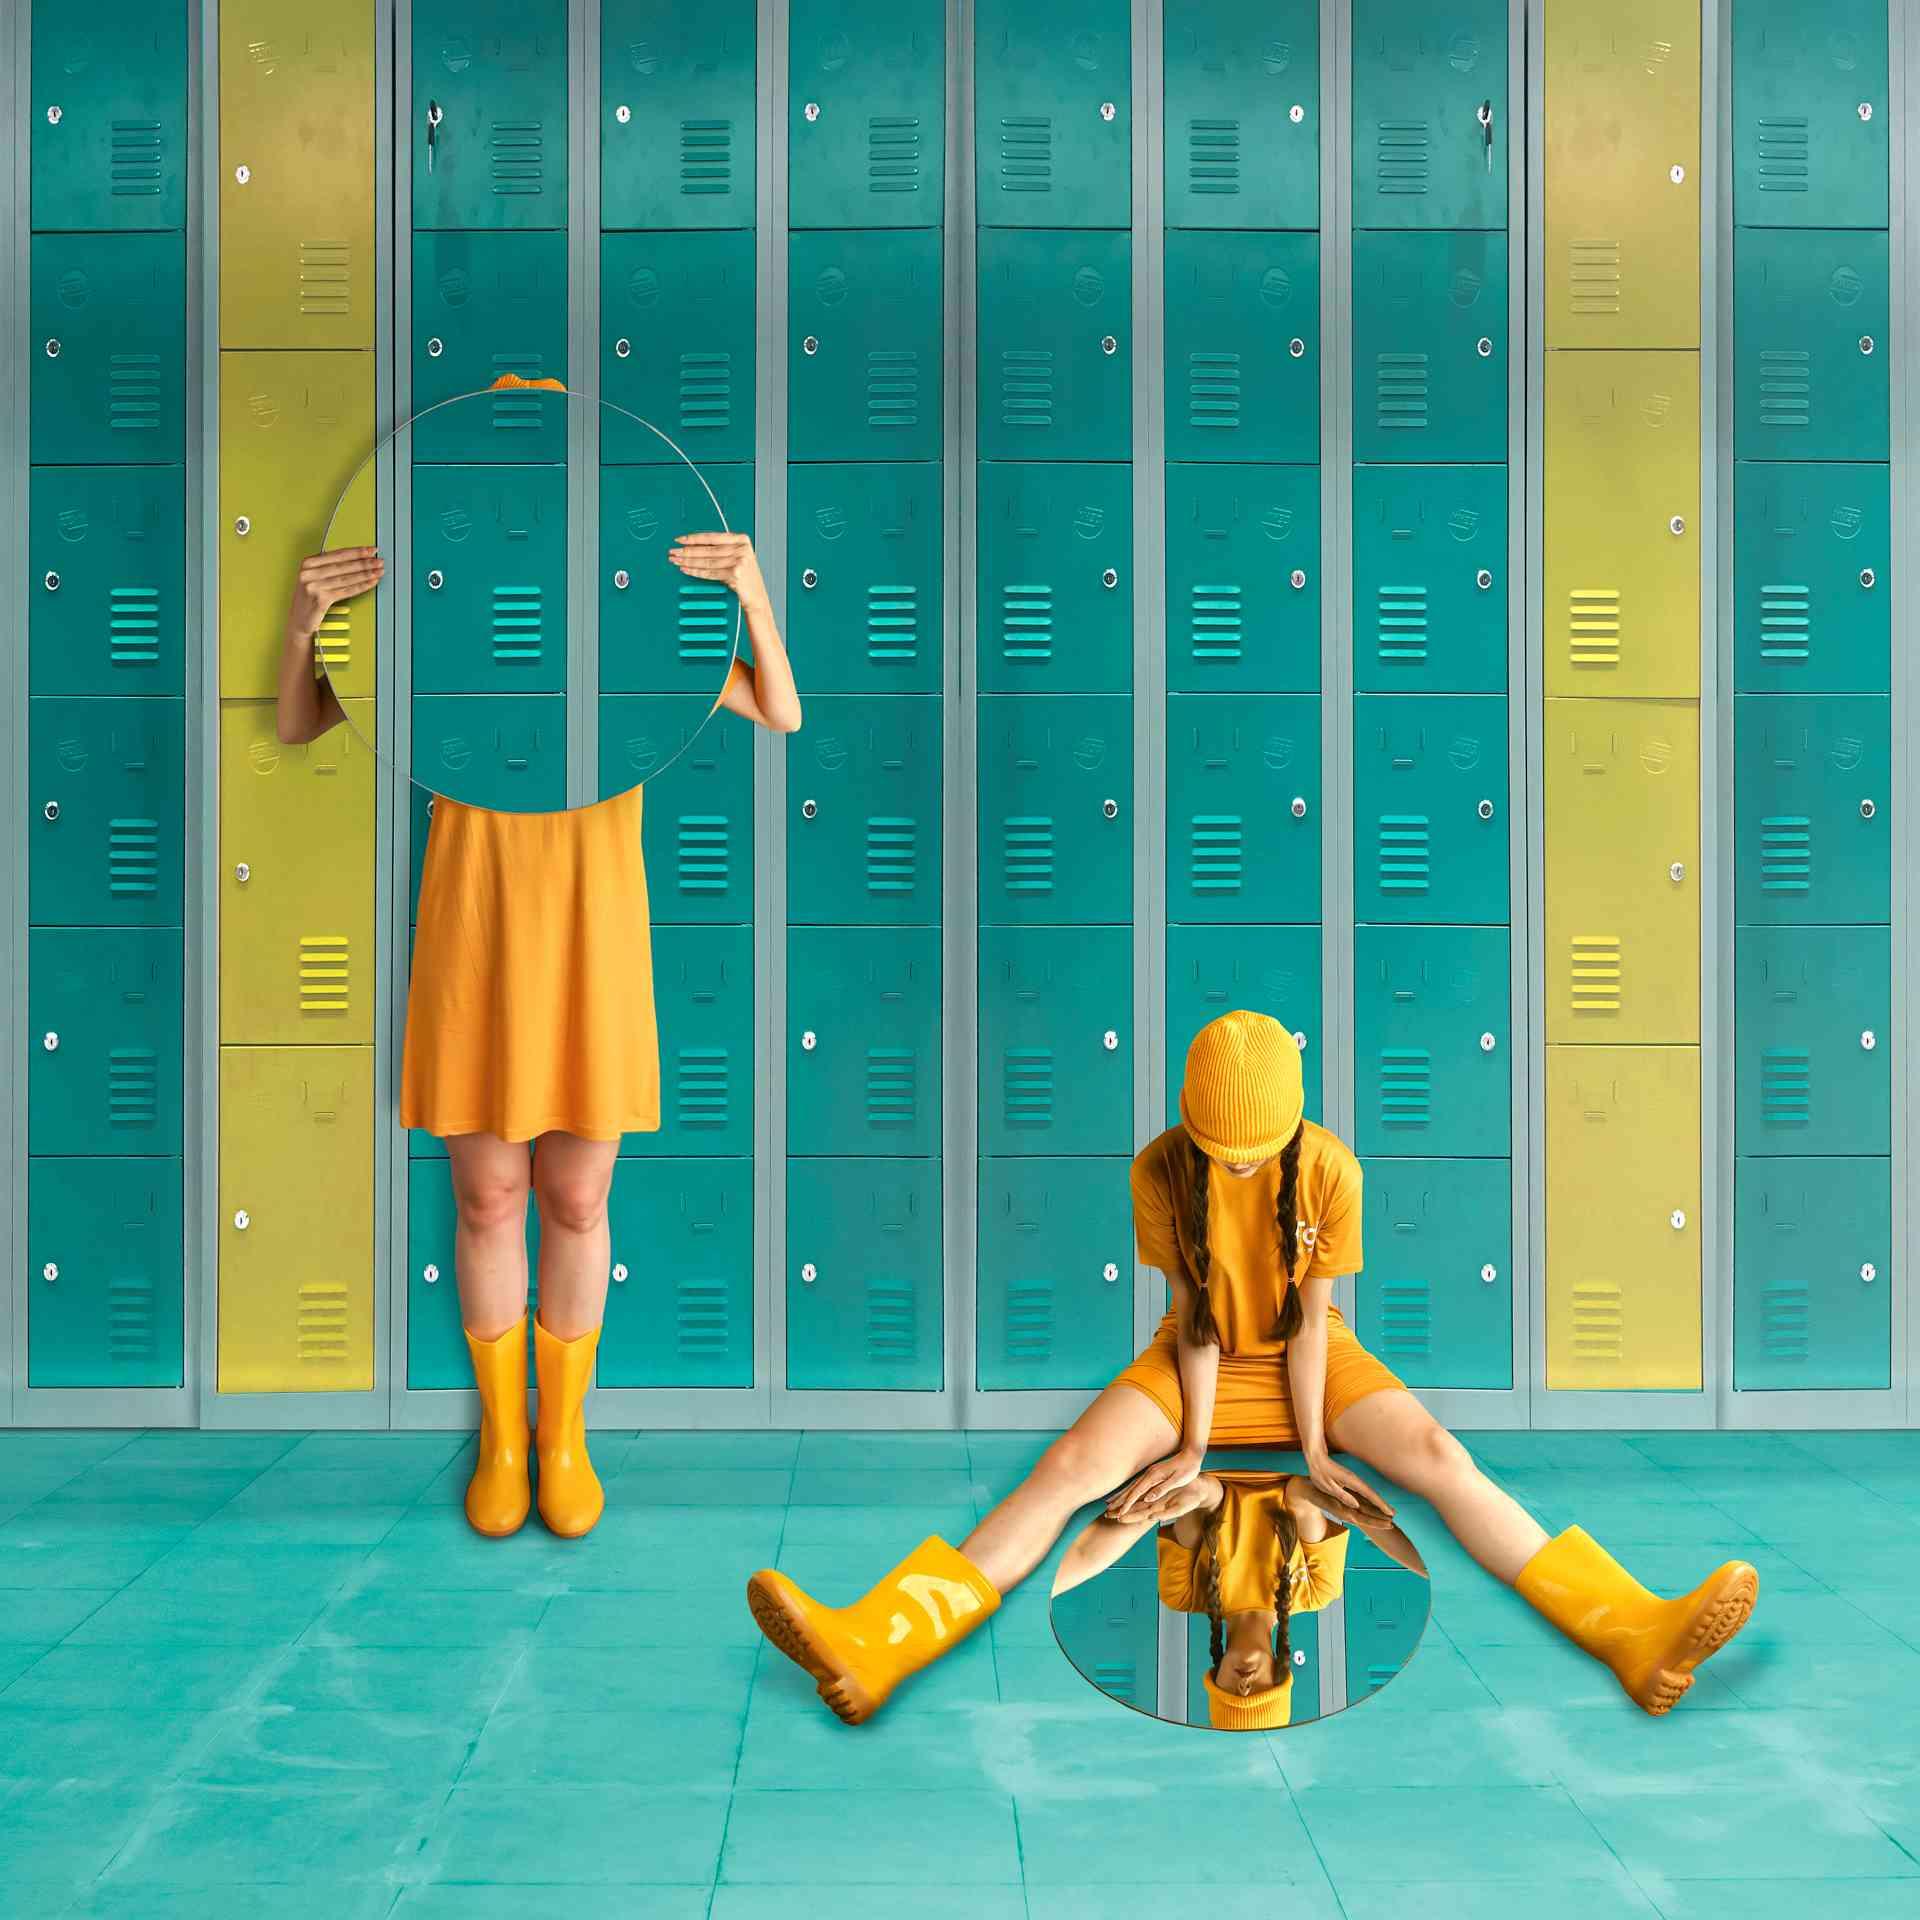 mirrors and lockers creative image